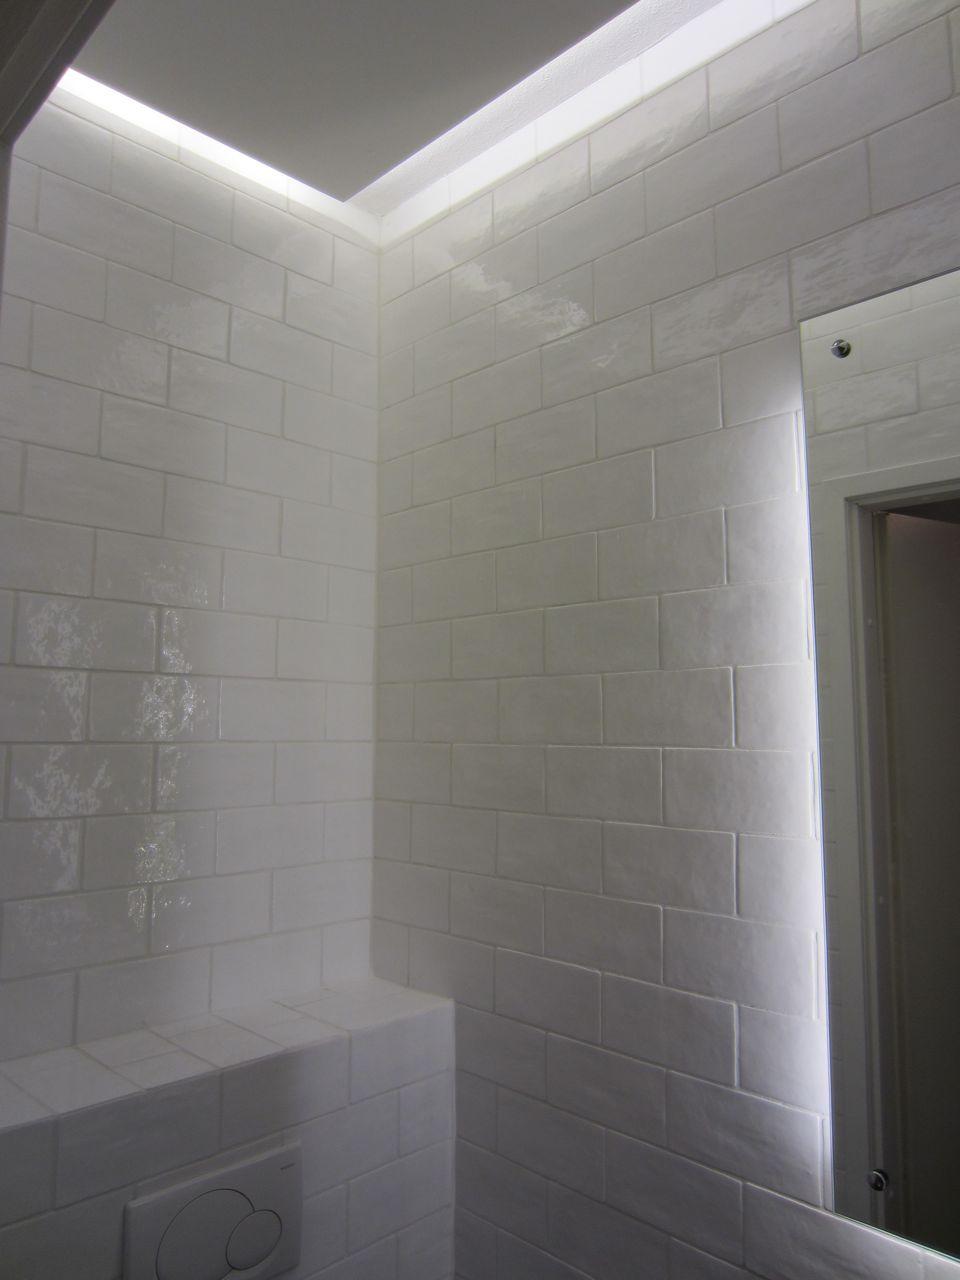 ... plafond badkamerverlichting led. Badkamerlampen kunnen bevestigd